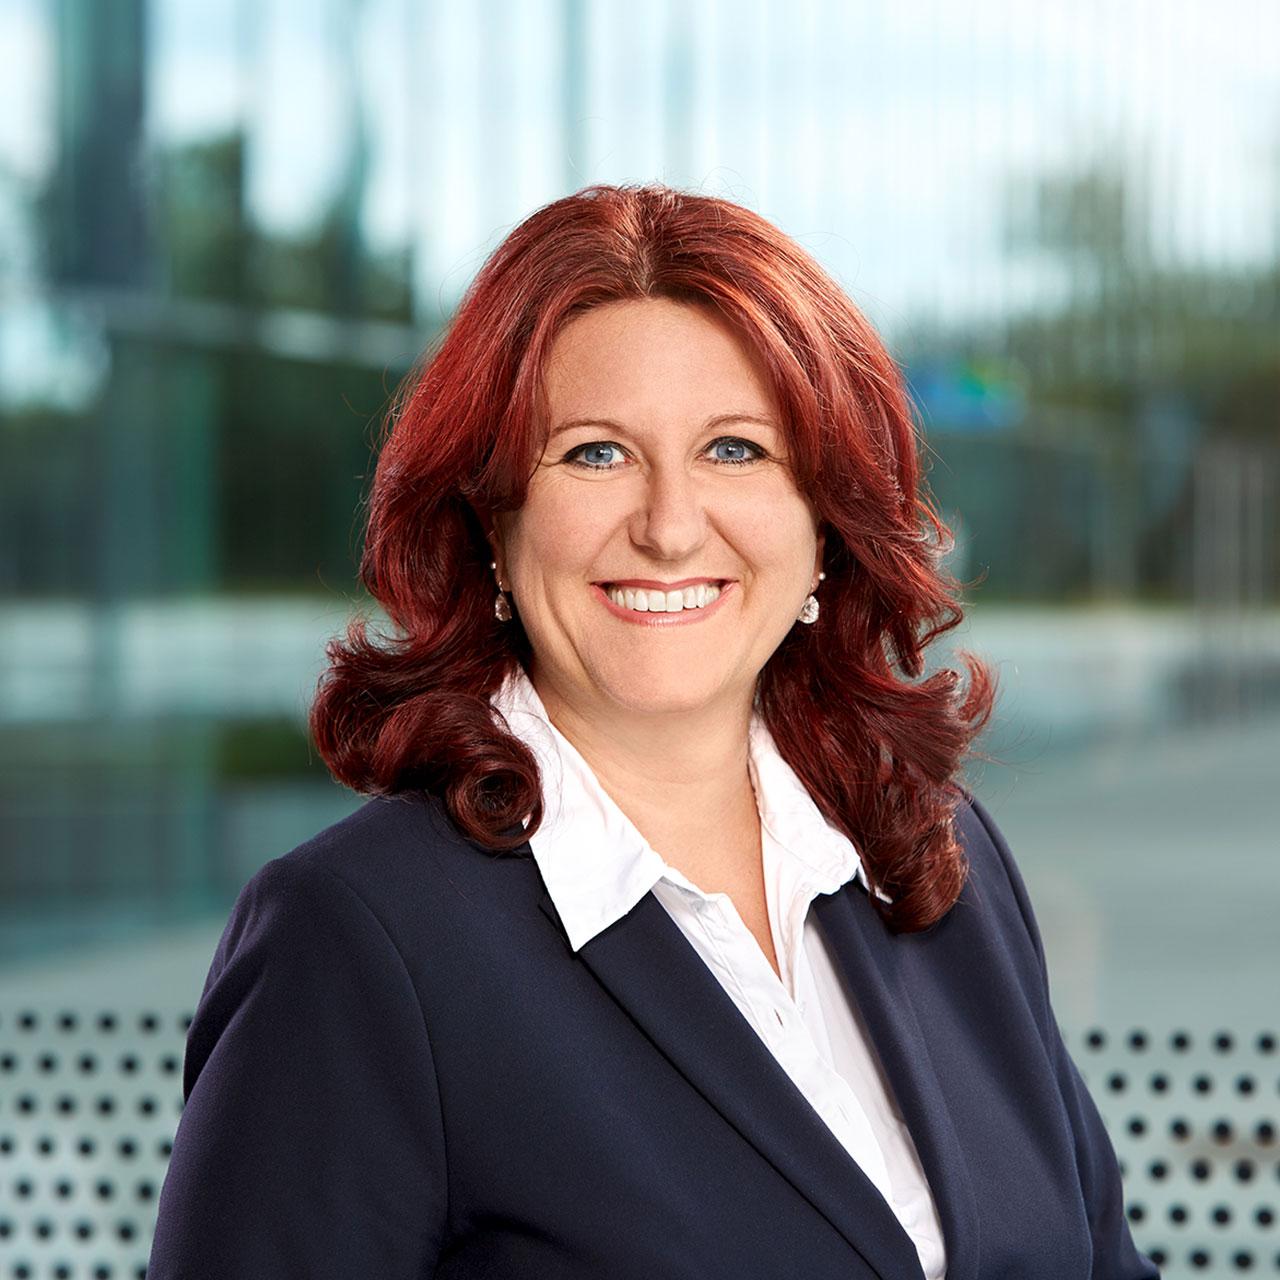 Projektassistentin Doris Kaltenbach